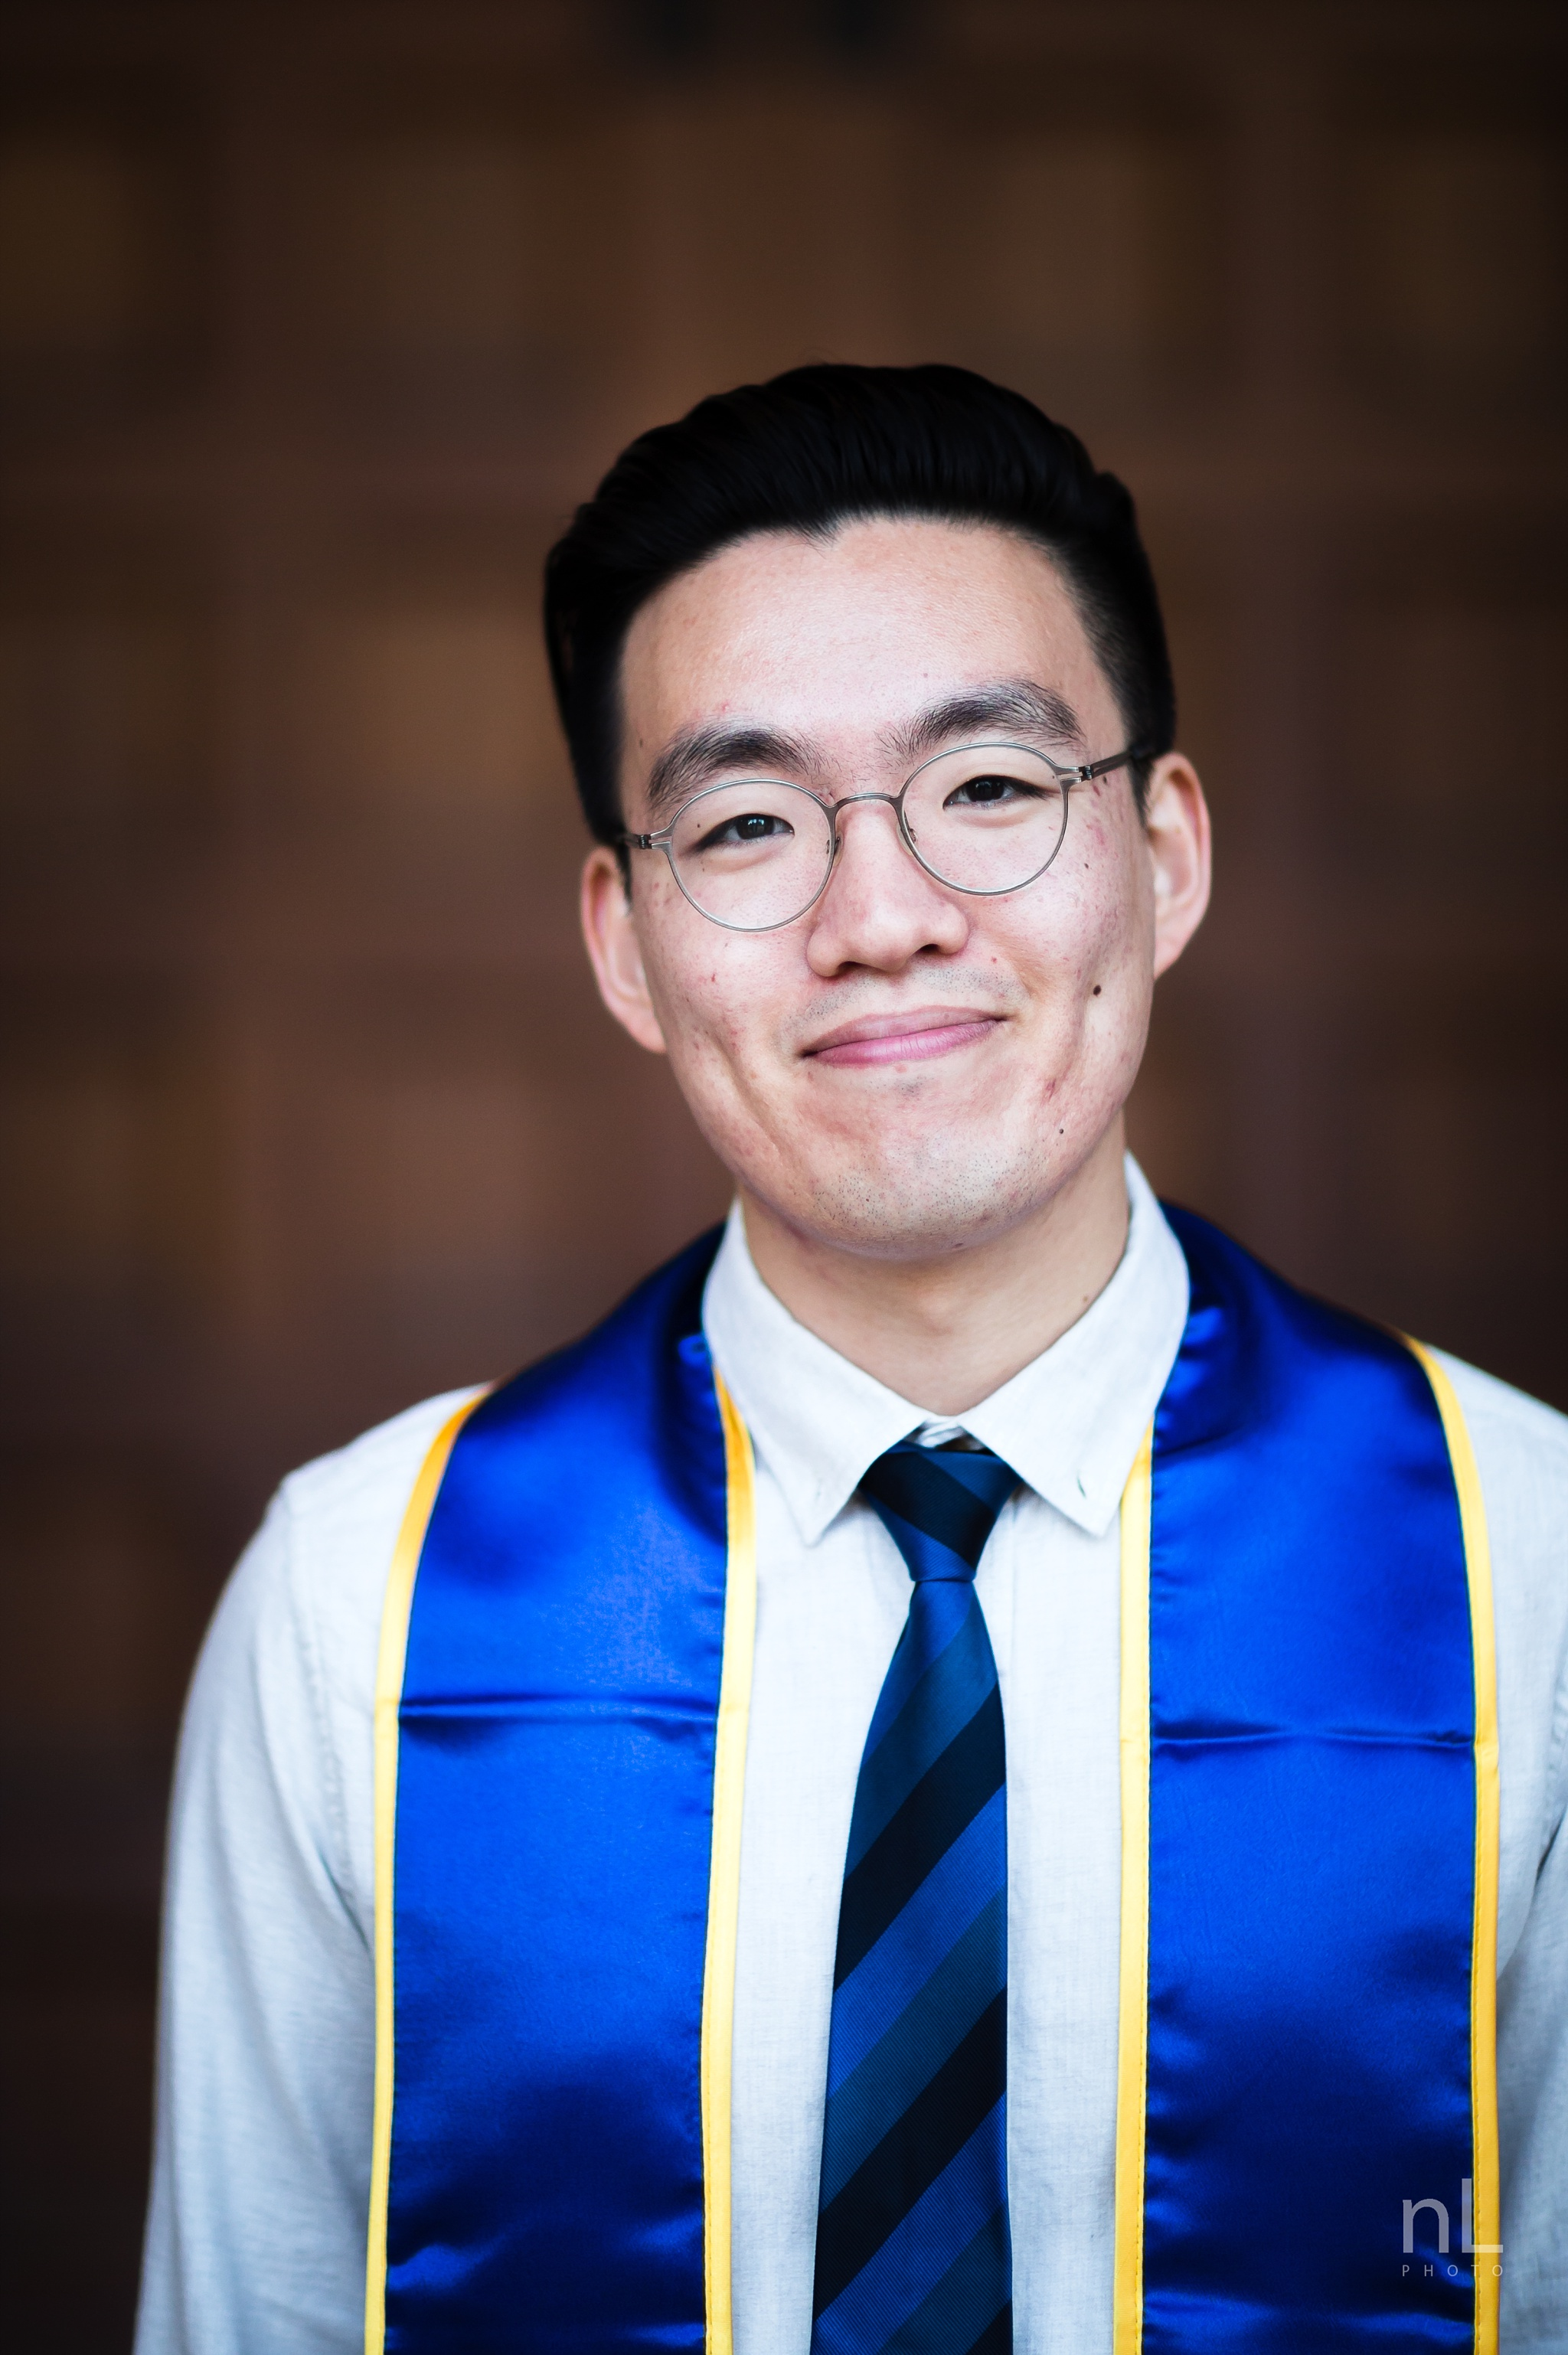 los angeles ucla senior graduation portrait of asian guy at royce front doors